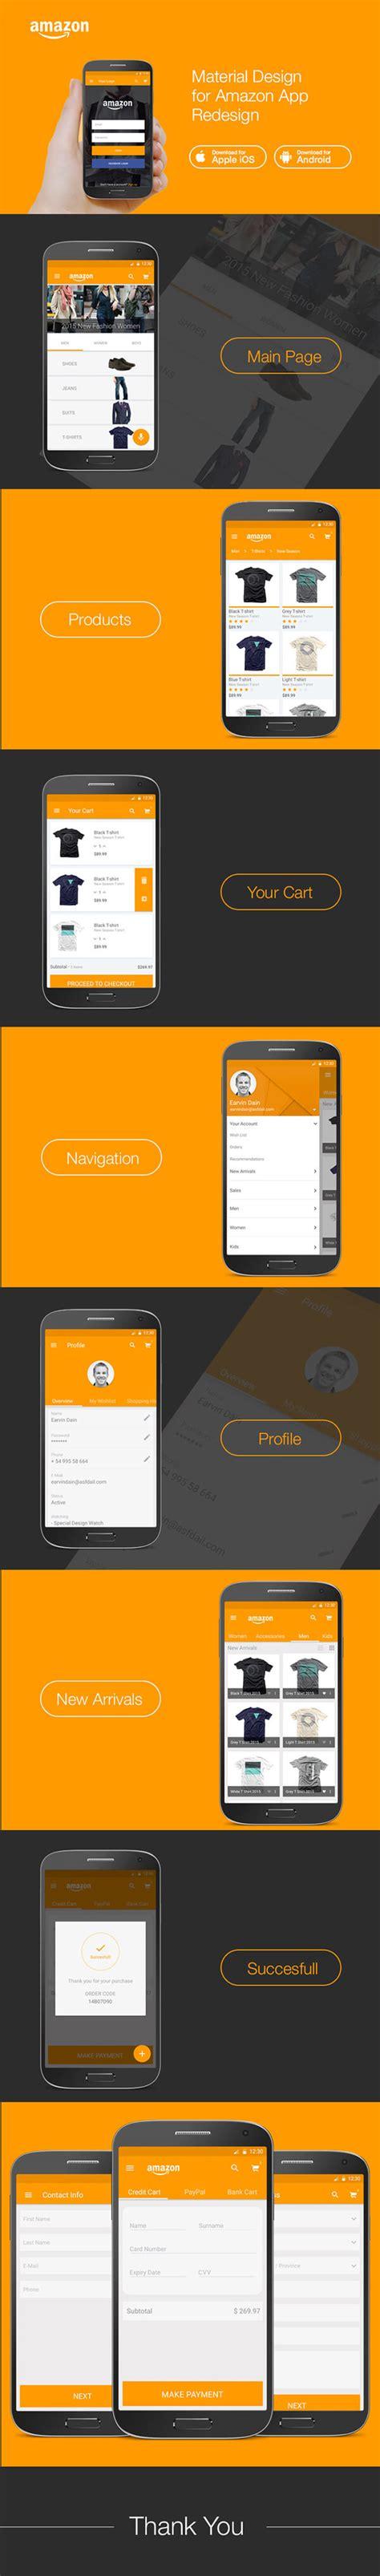 material design app mockup material design e commerce ui concept